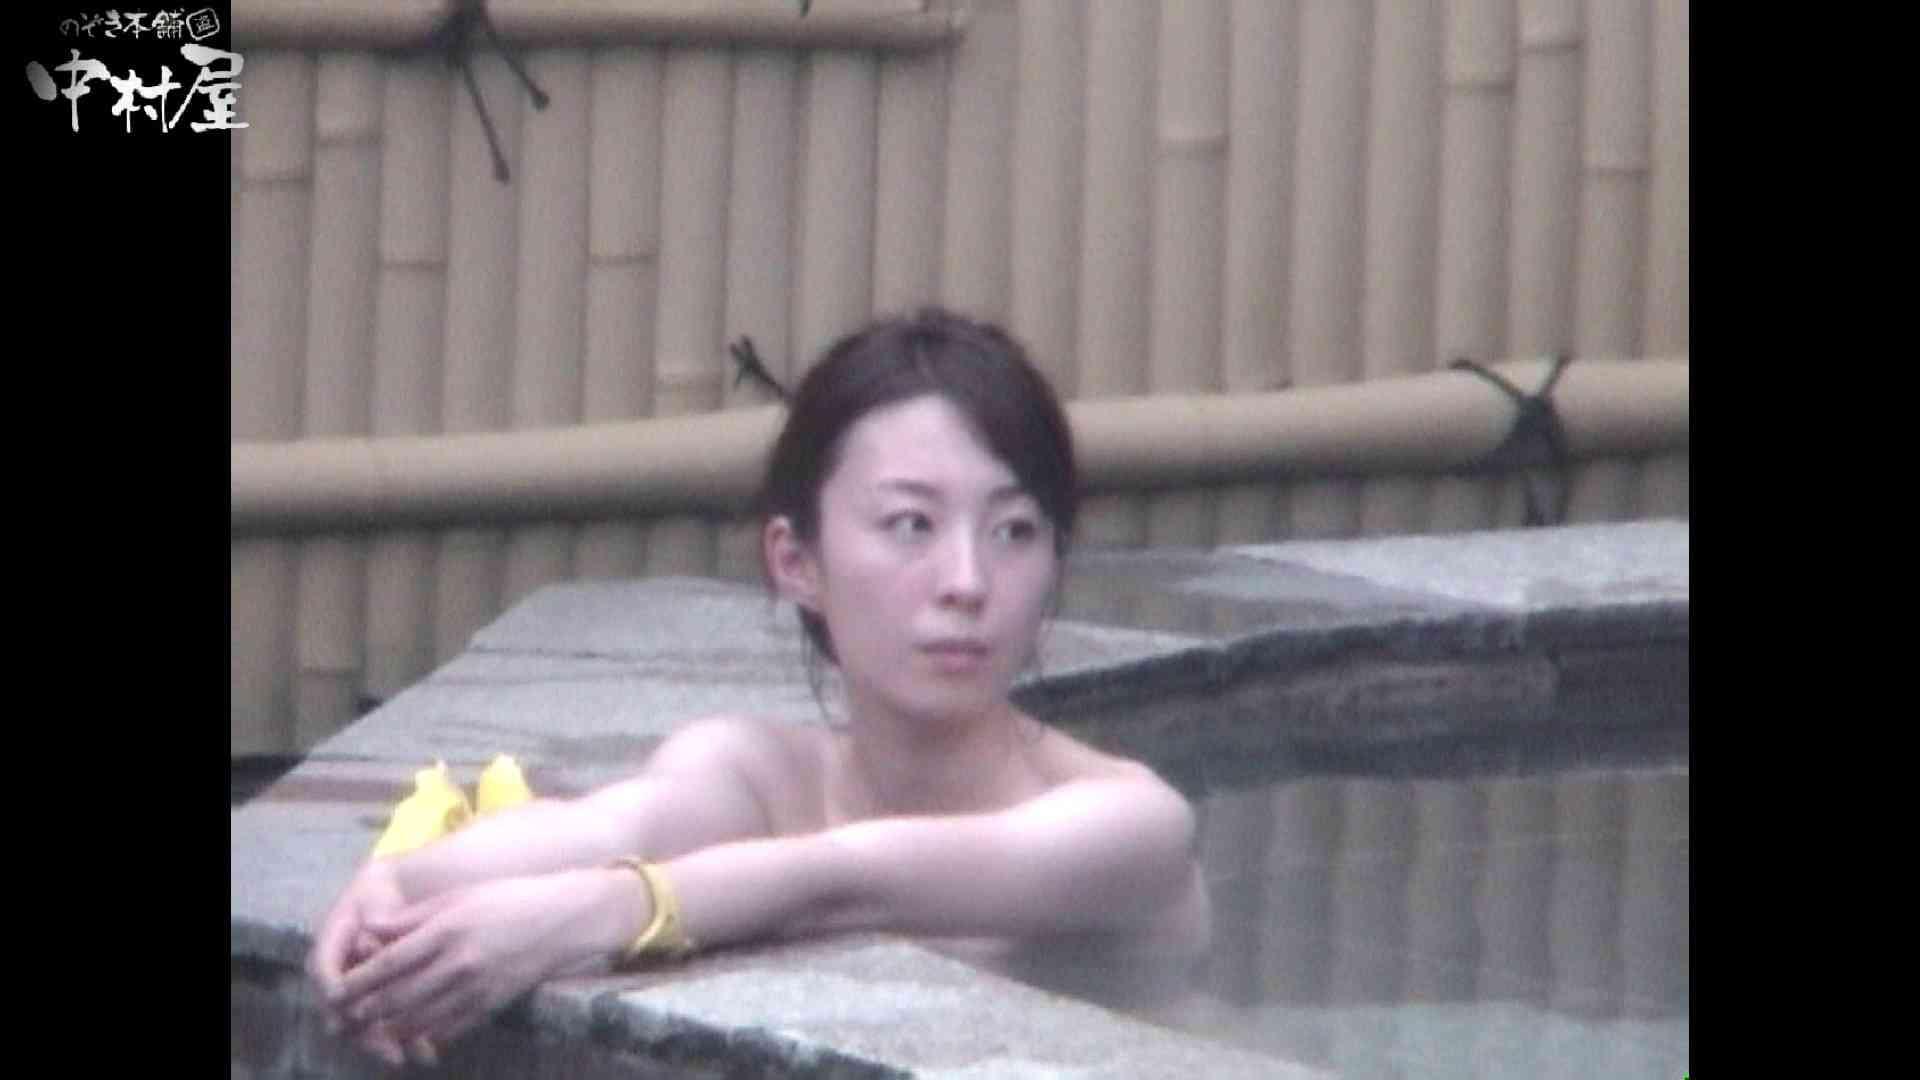 Aquaな露天風呂Vol.964 露天風呂編  112PIX 8